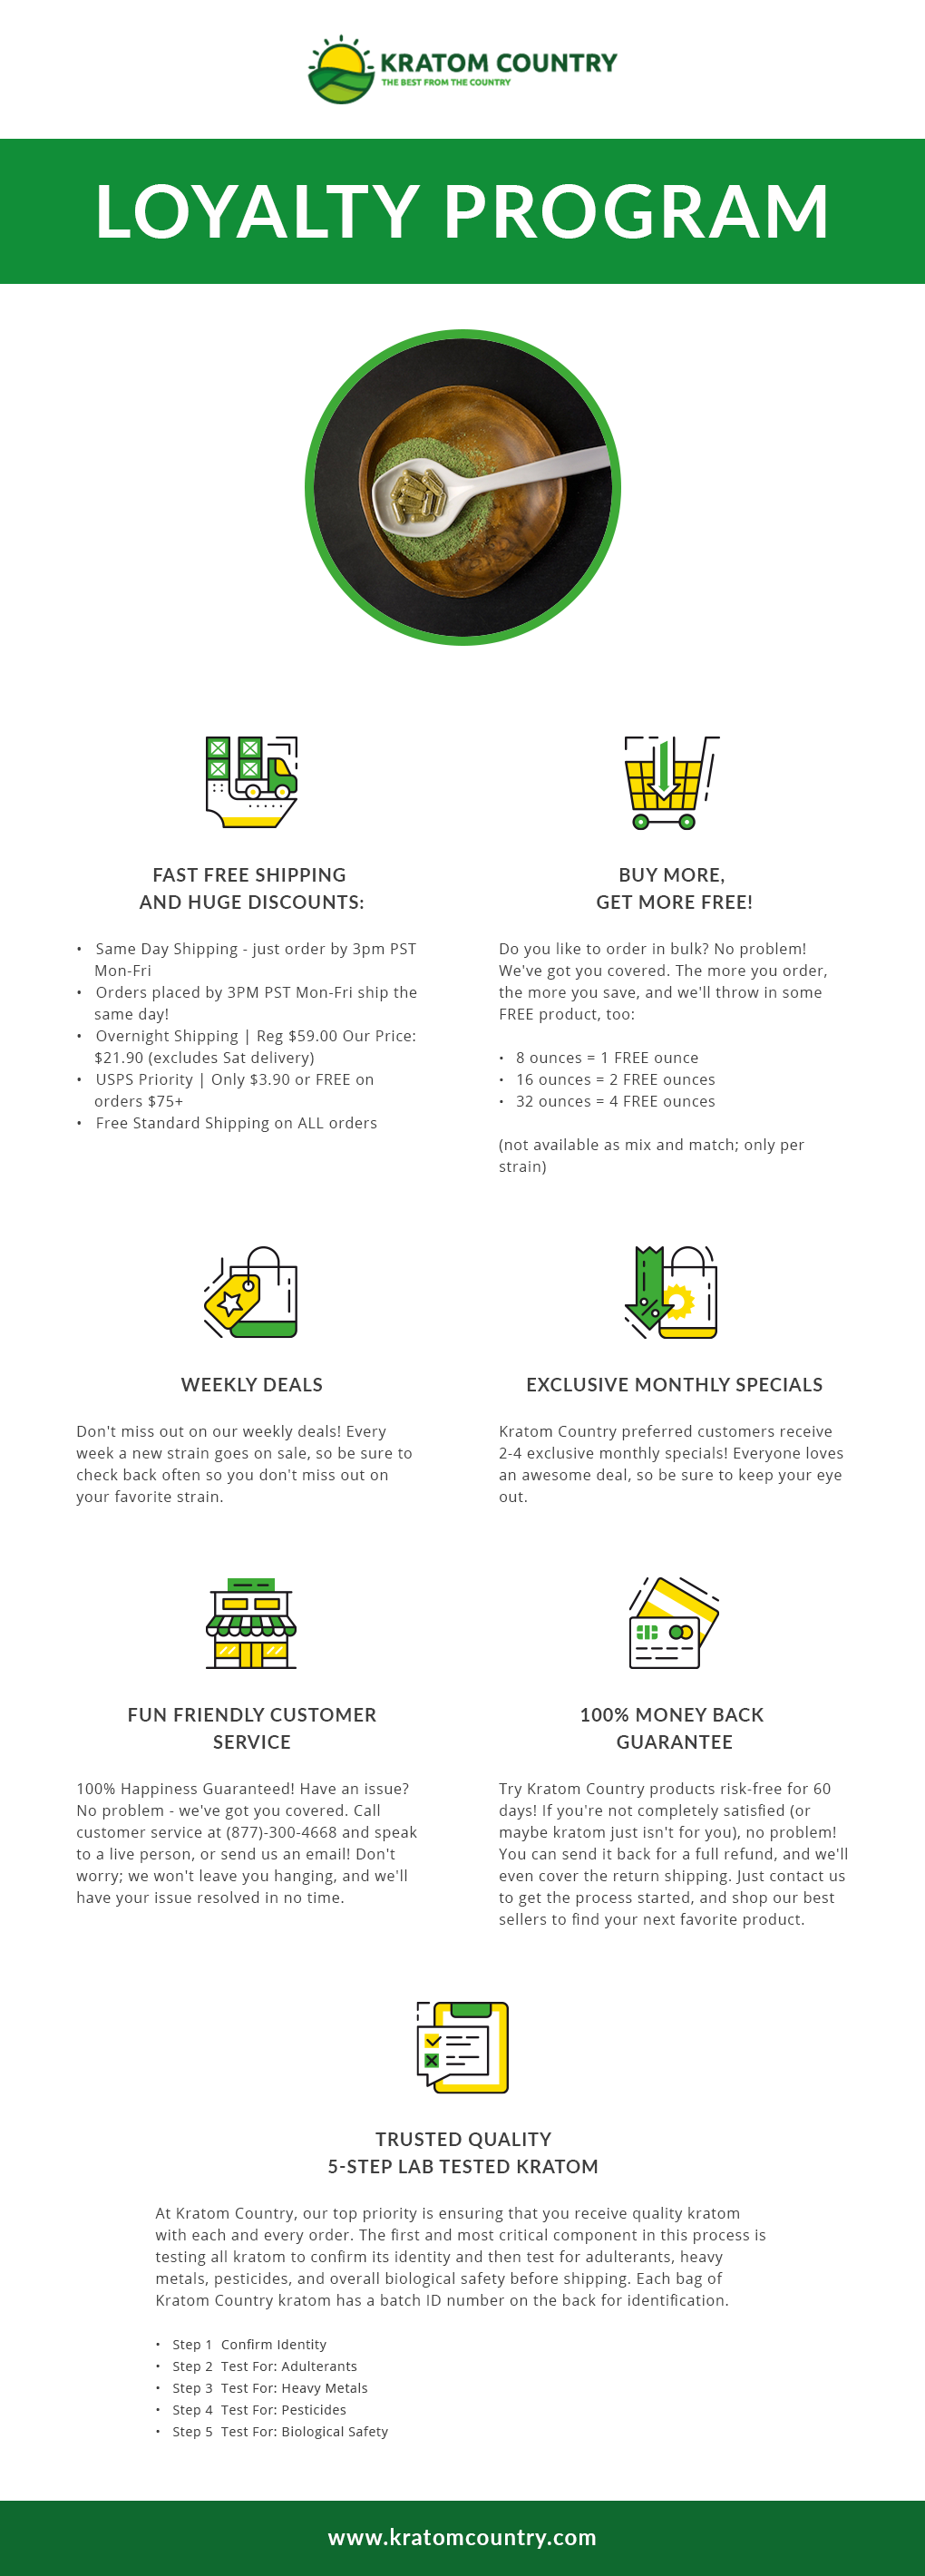 Kratom Country Loyalty Program Infographic